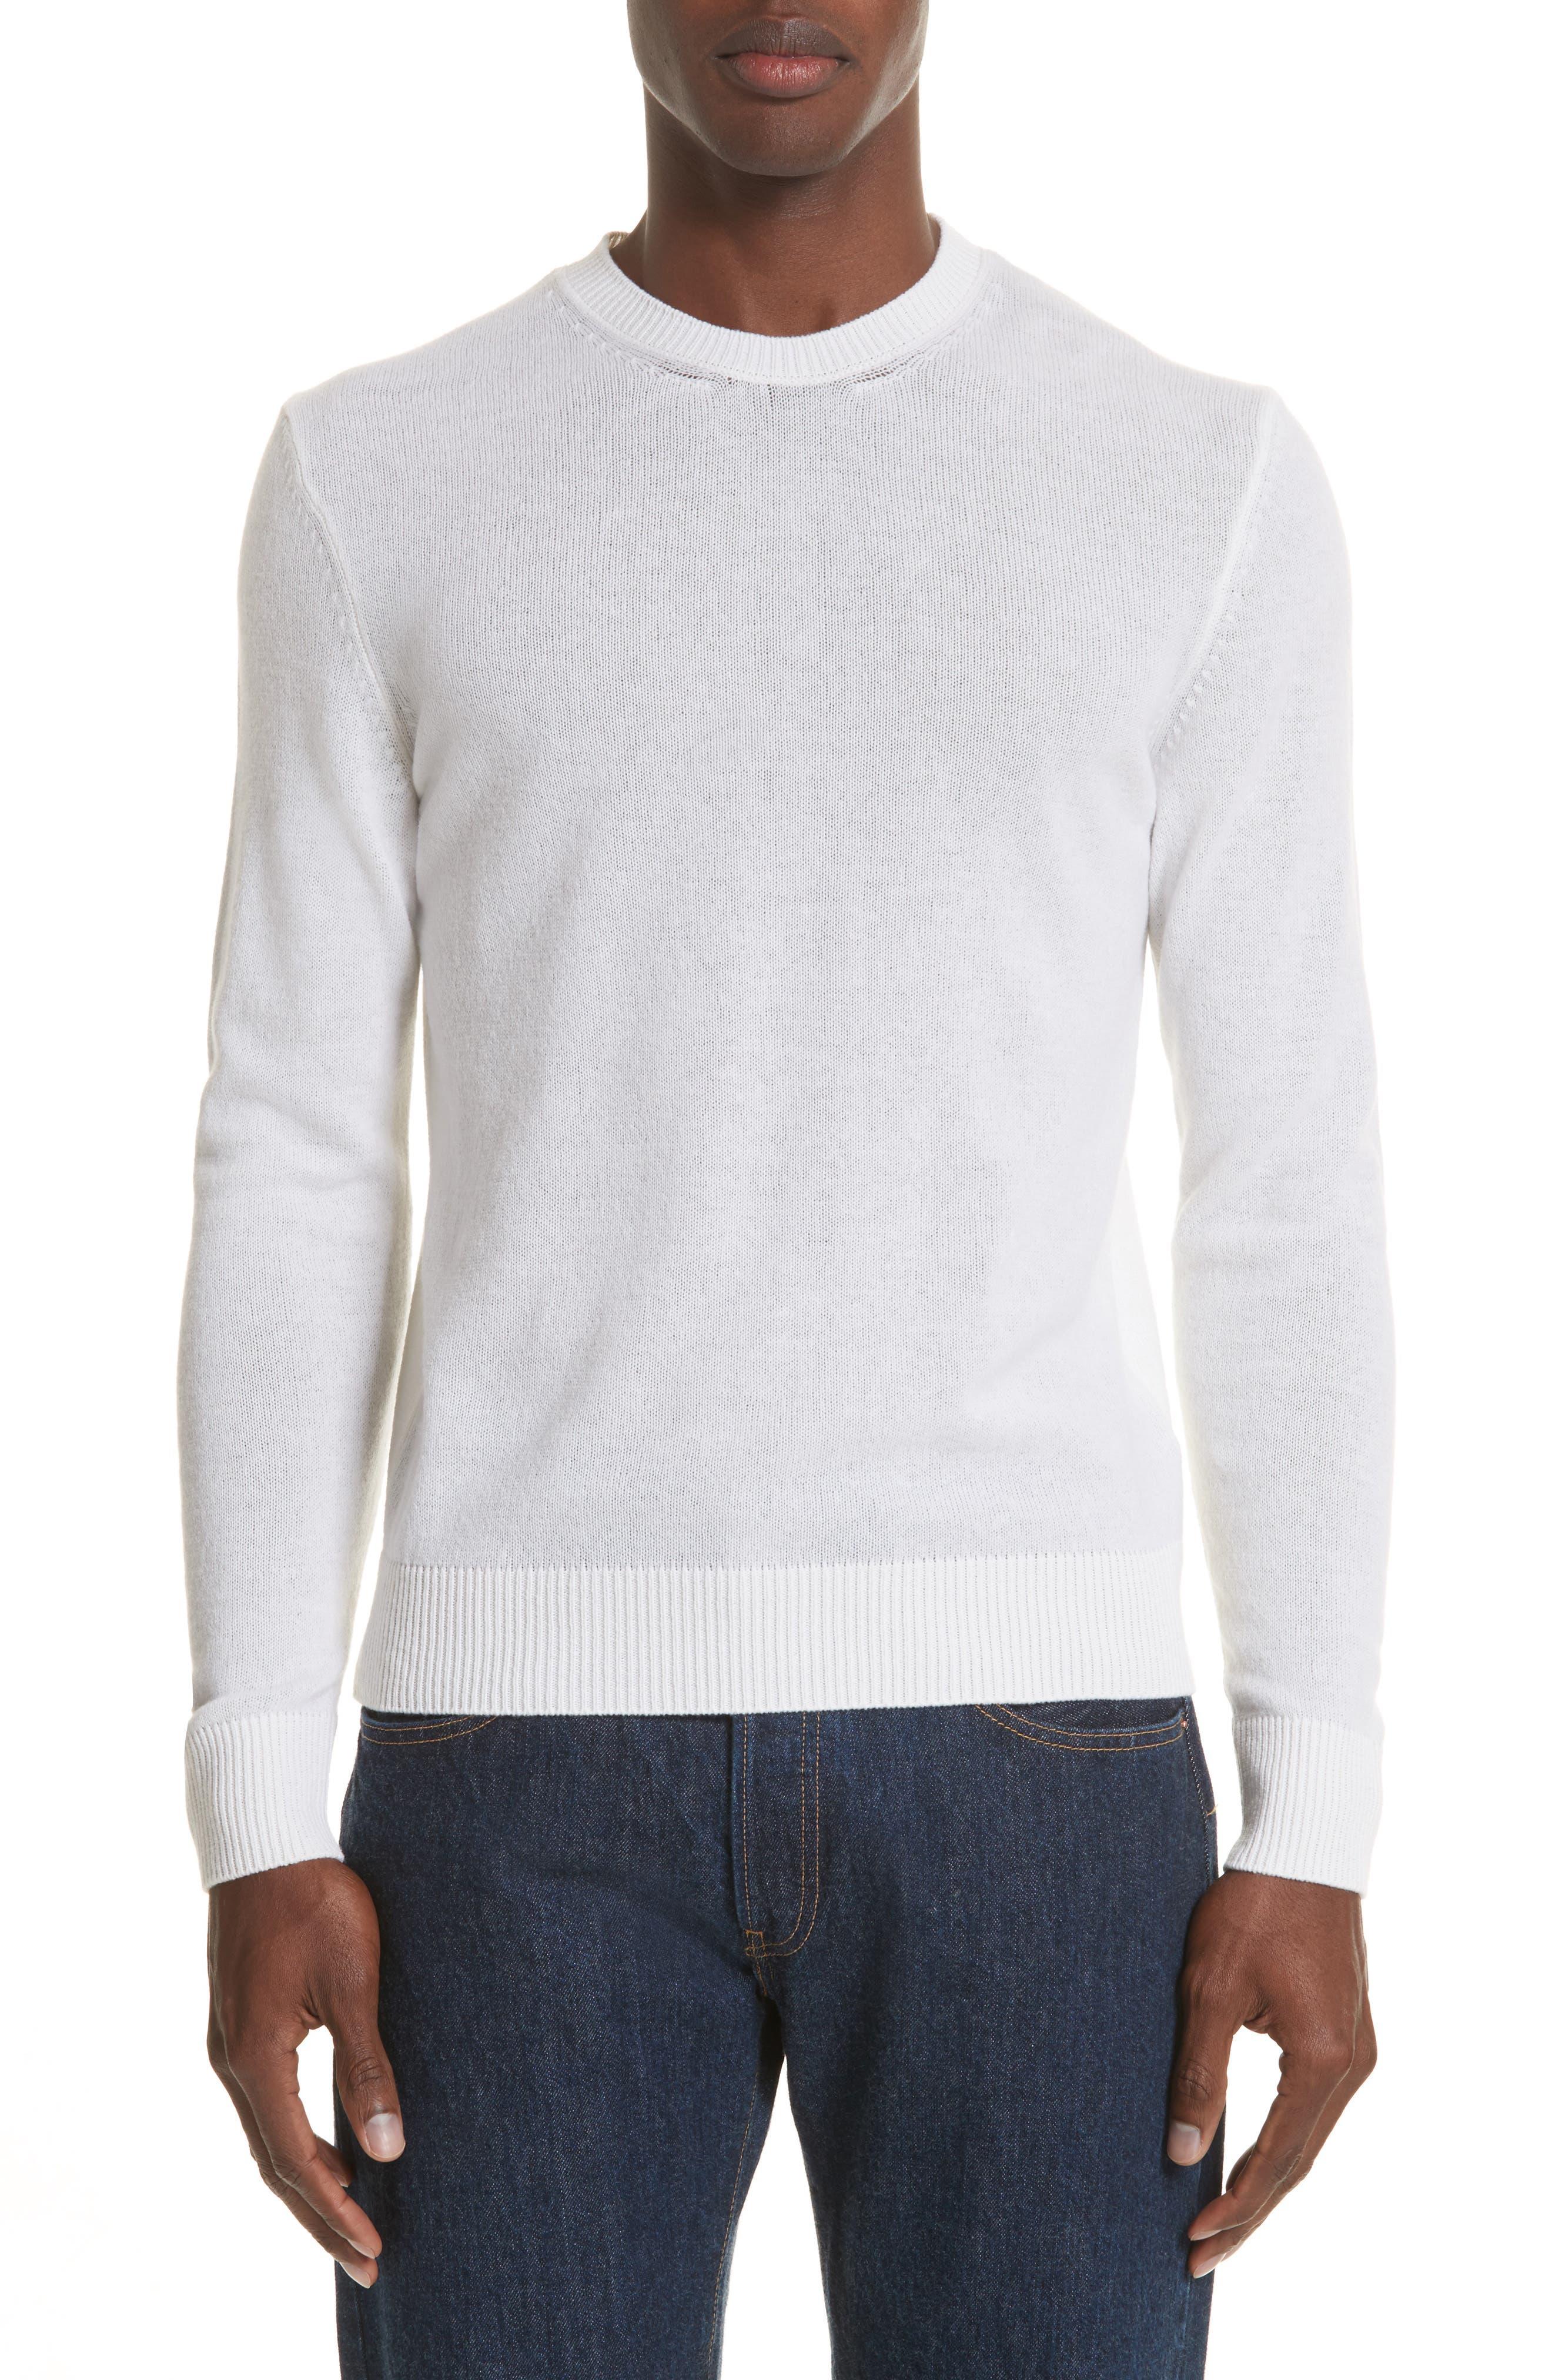 Moncler Cashmere Crewneck Sweater